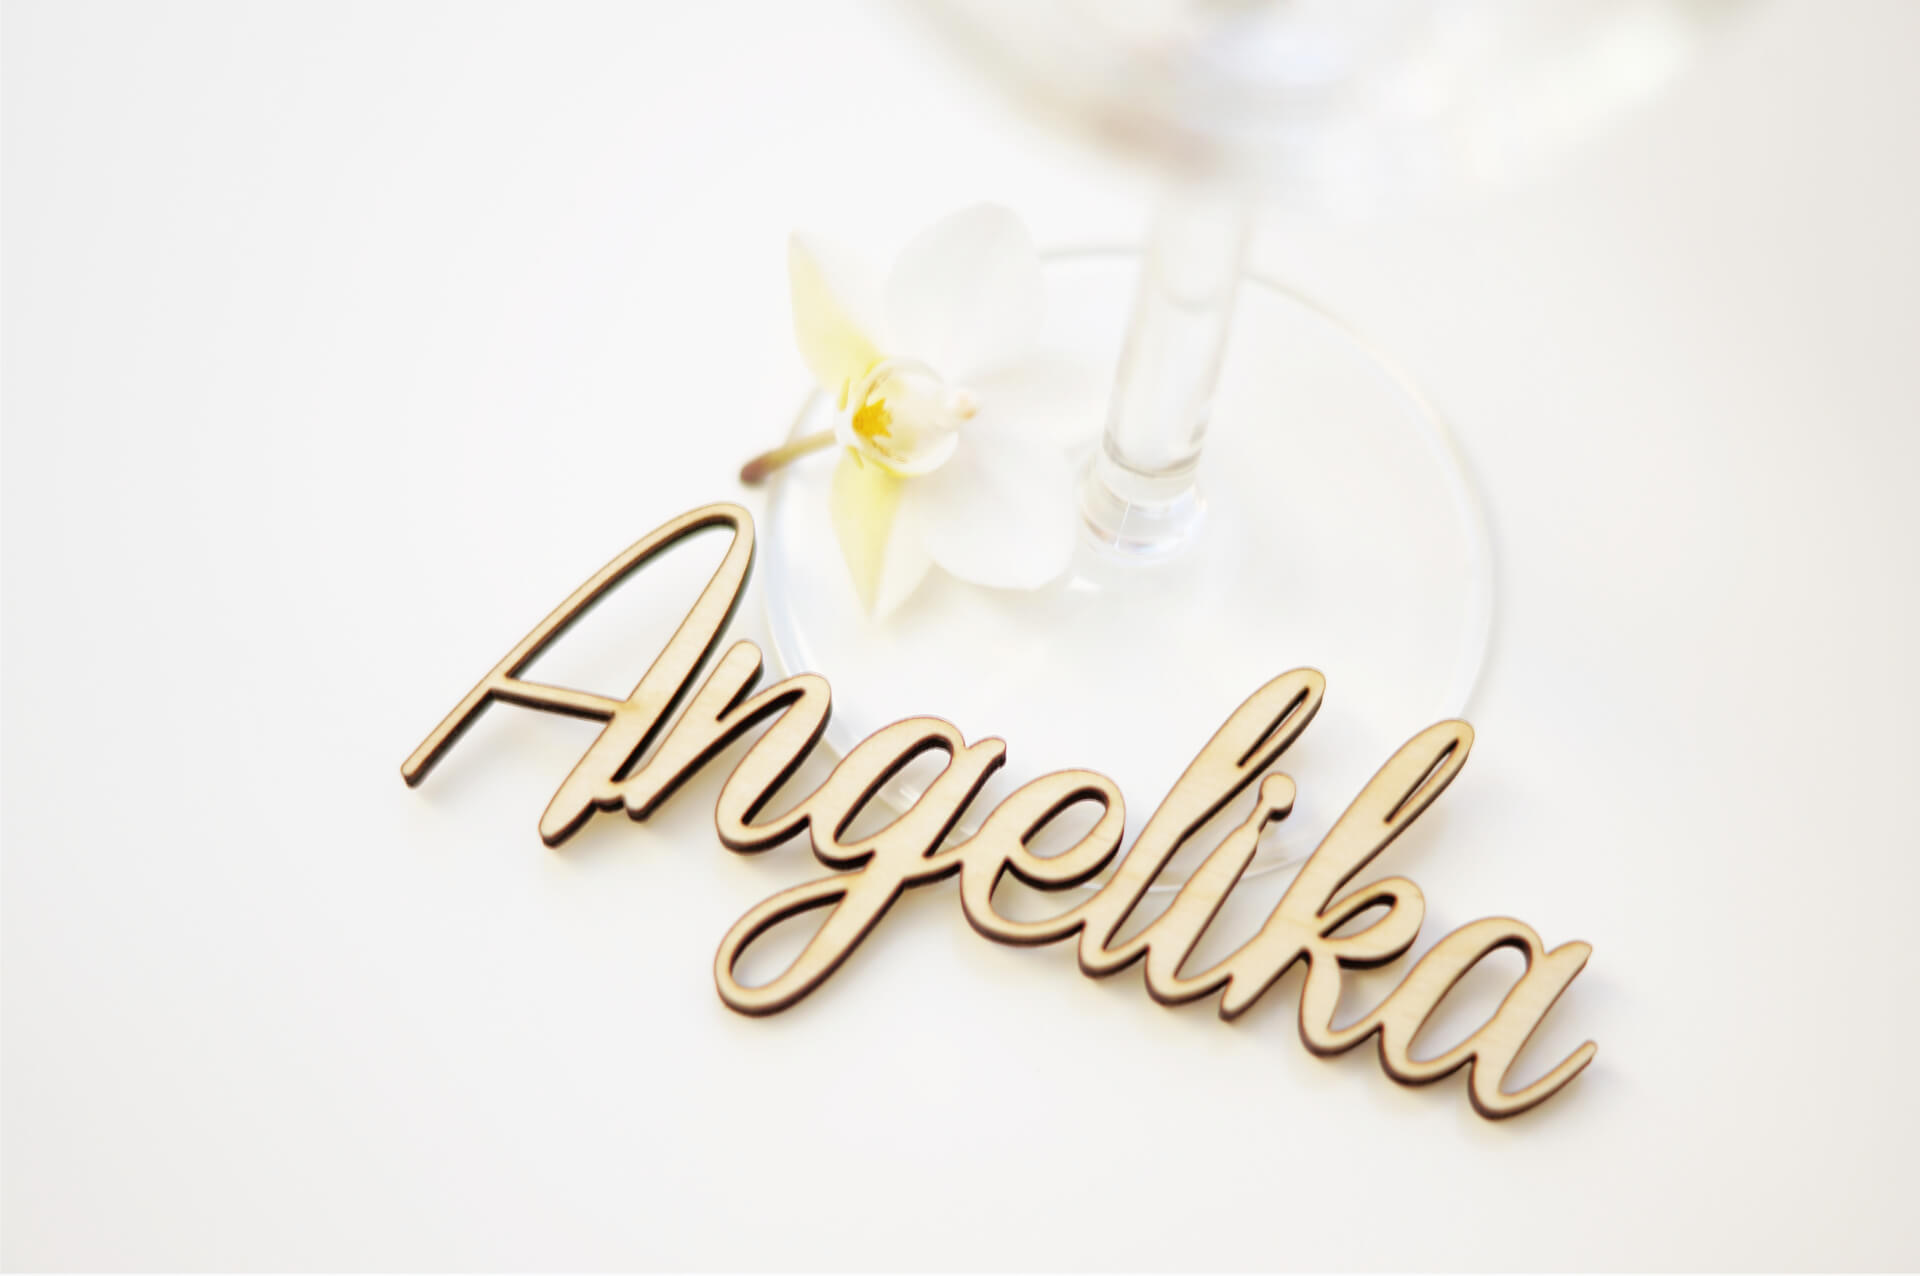 1-Namensschriftzug-Tischkarte-Holz-Hochzeit